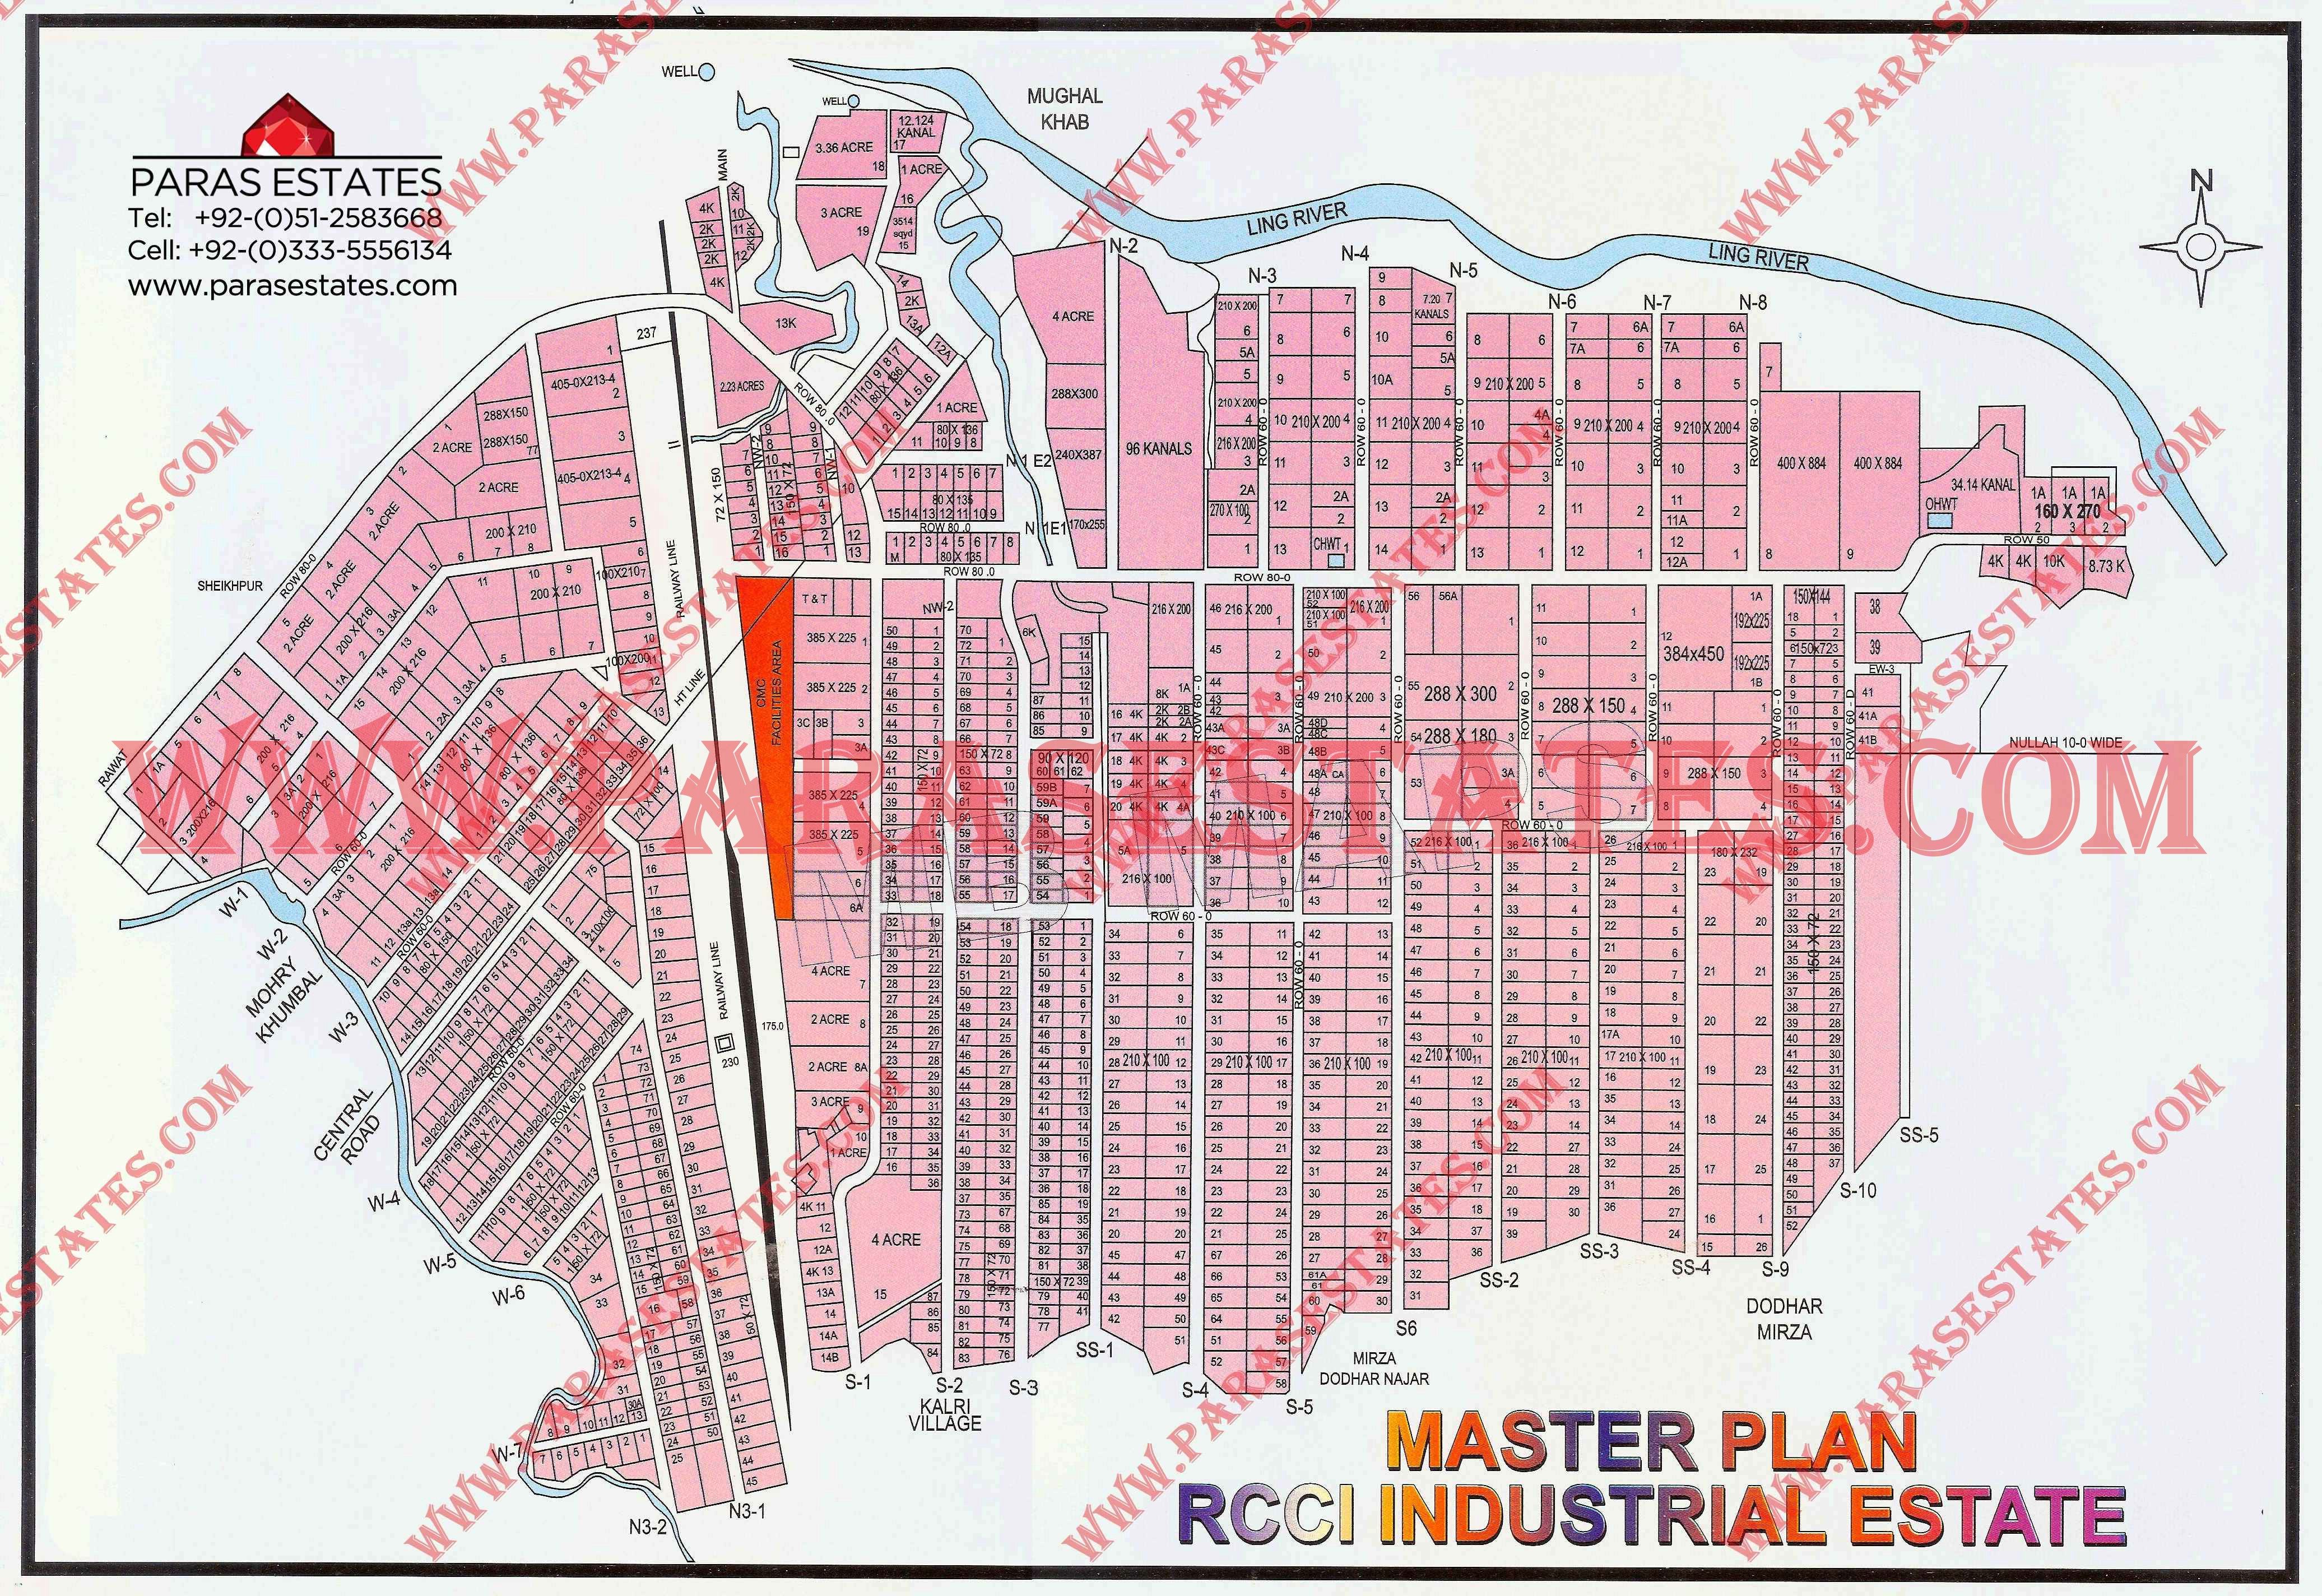 Industrial Estates Maps » Paras Estates